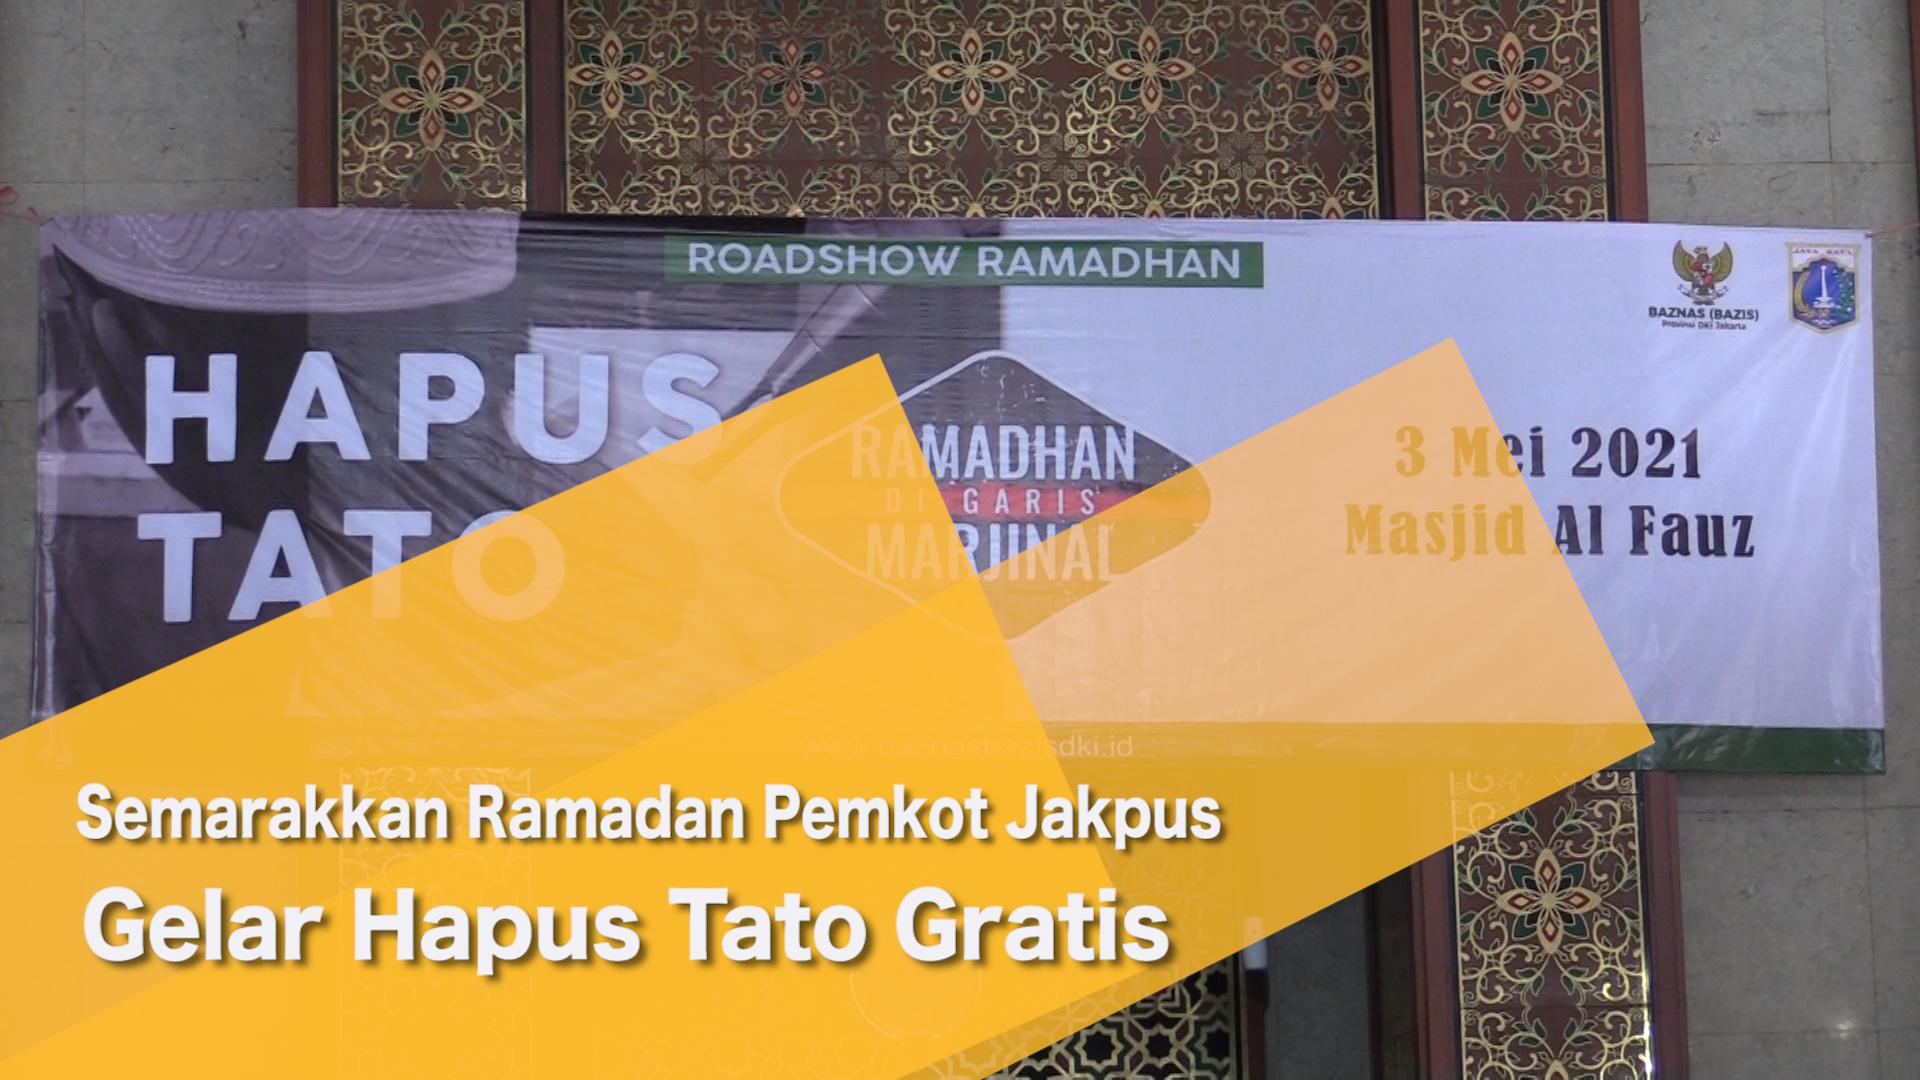 Semarakkan Ramadan Pemkot Jakpus Gelar Hapus Tato Gratis